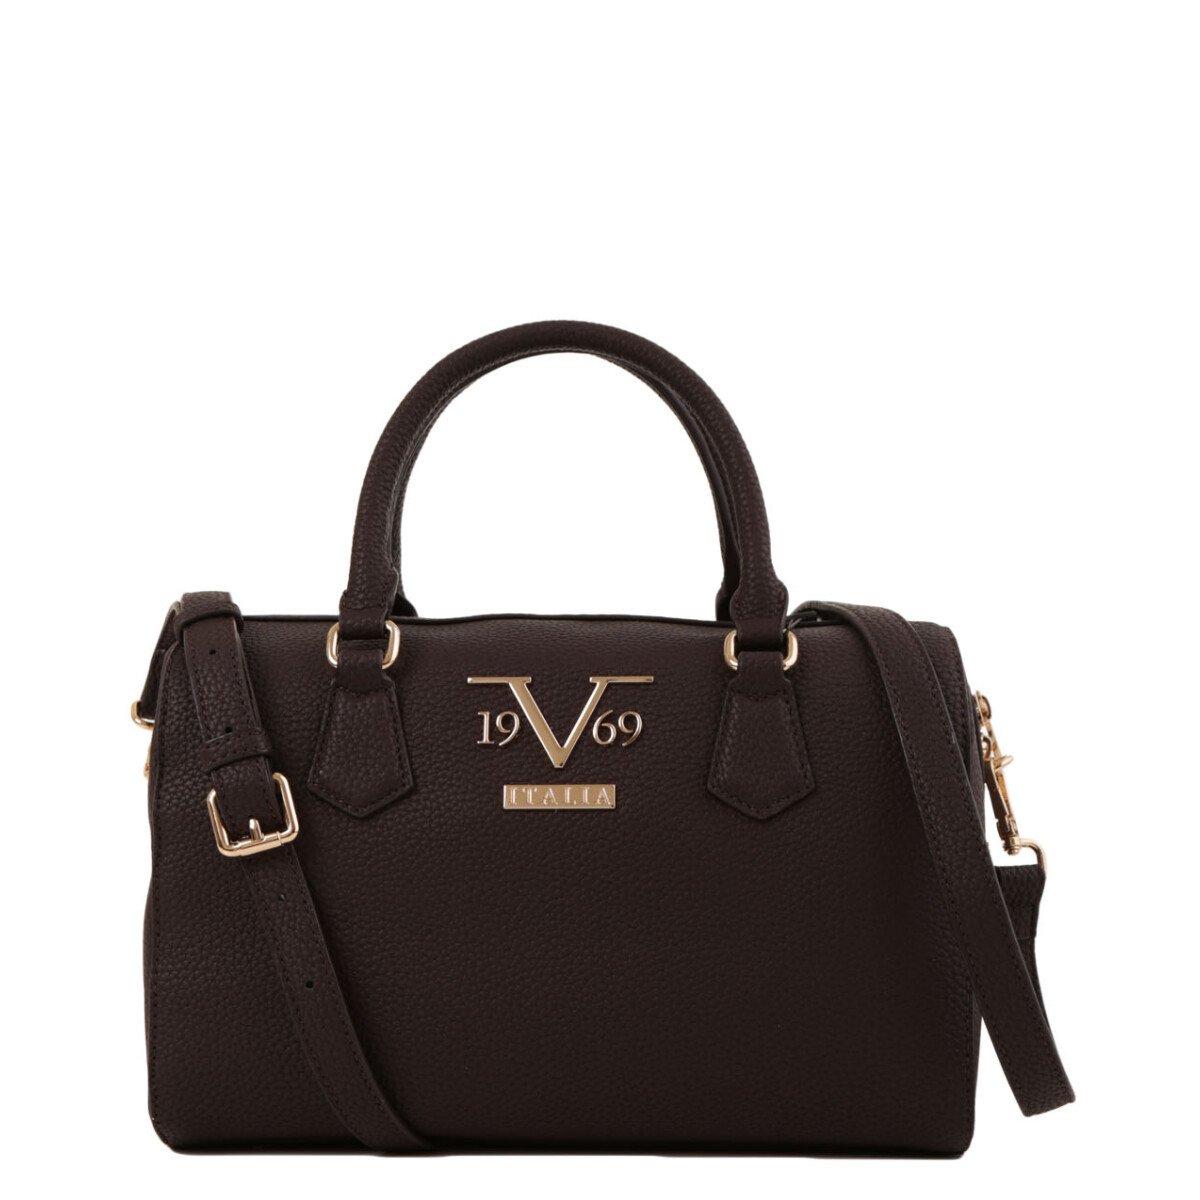 19v69 Italia Women's Handbag Various Colours 319009 - brown UNICA